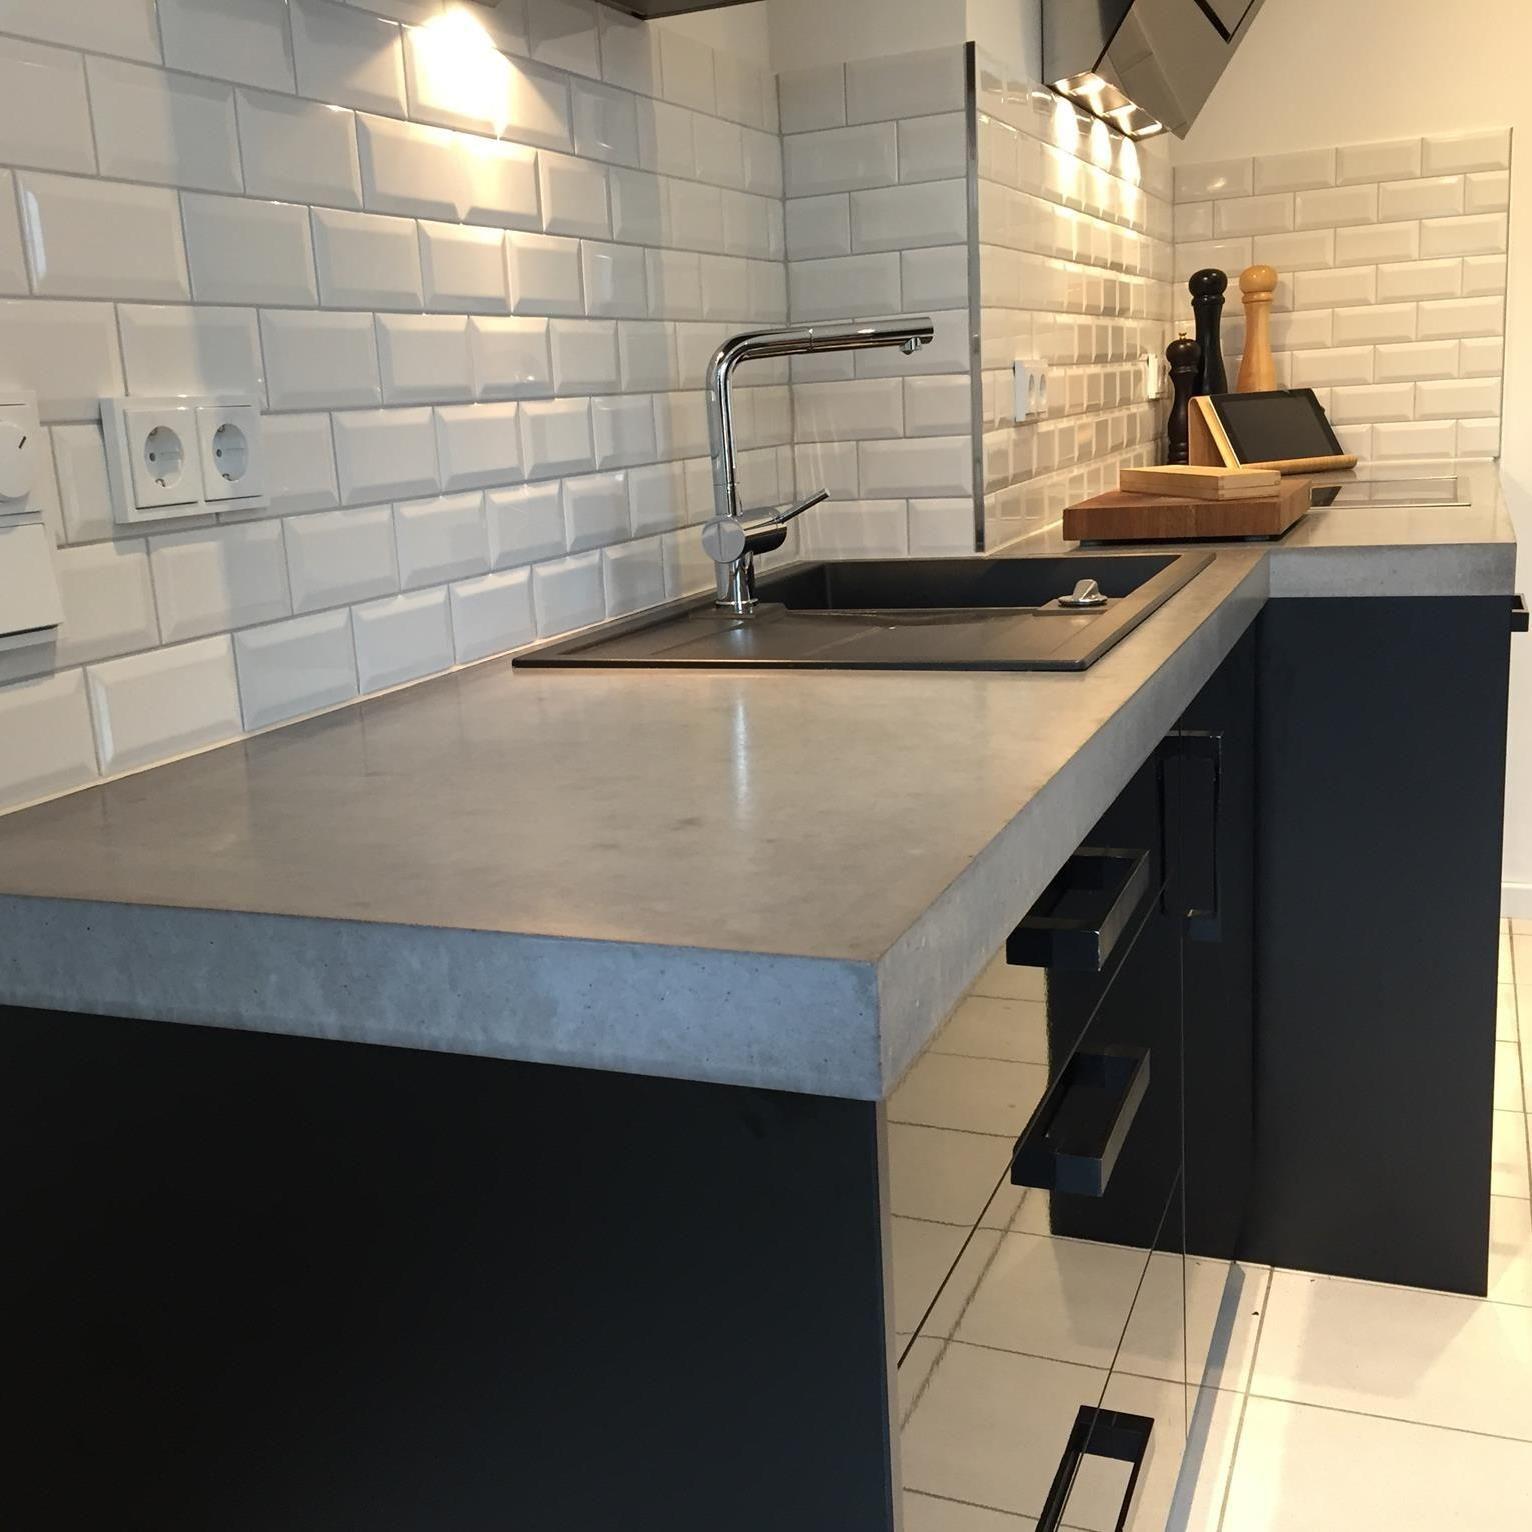 diy beton arbeitsplatte | for the home | pinterest | diy, concrete